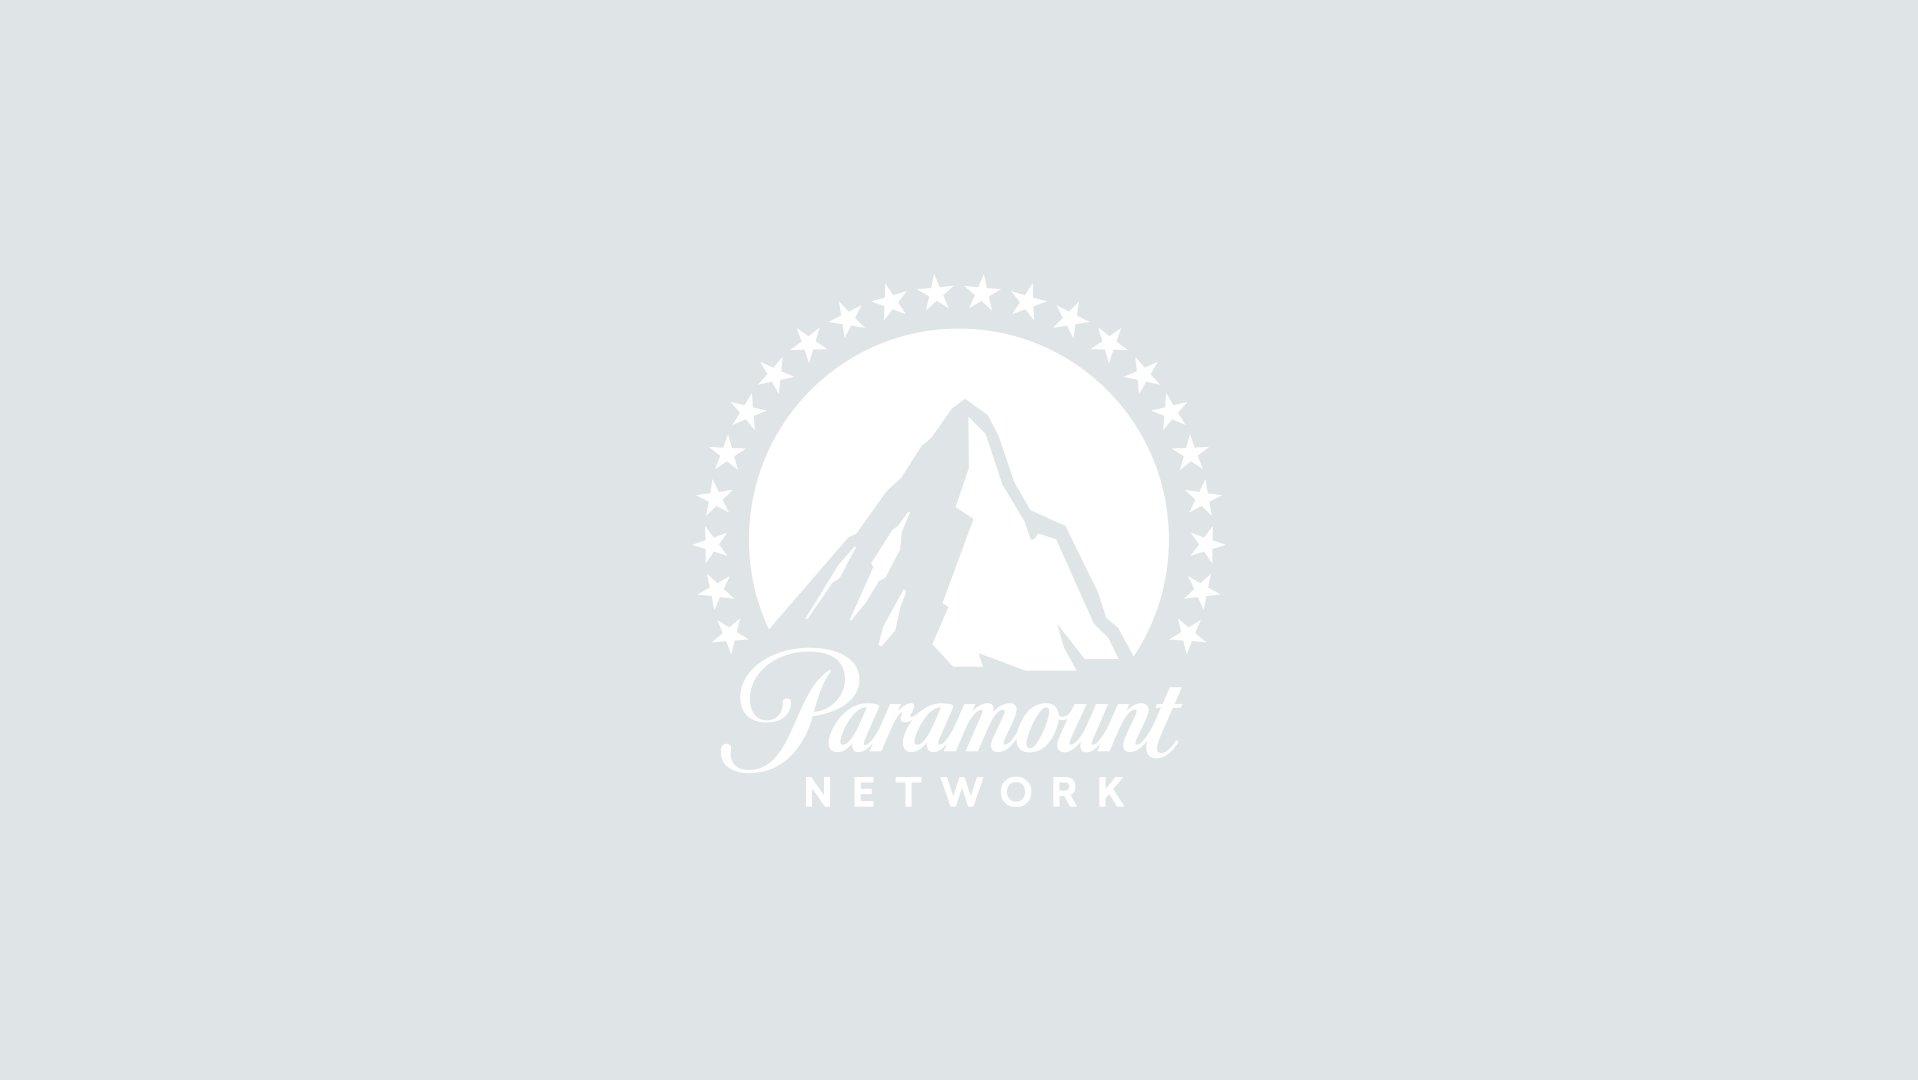 Clark Gable e Vivien Leigh (Via col vento), foto: Getty Images